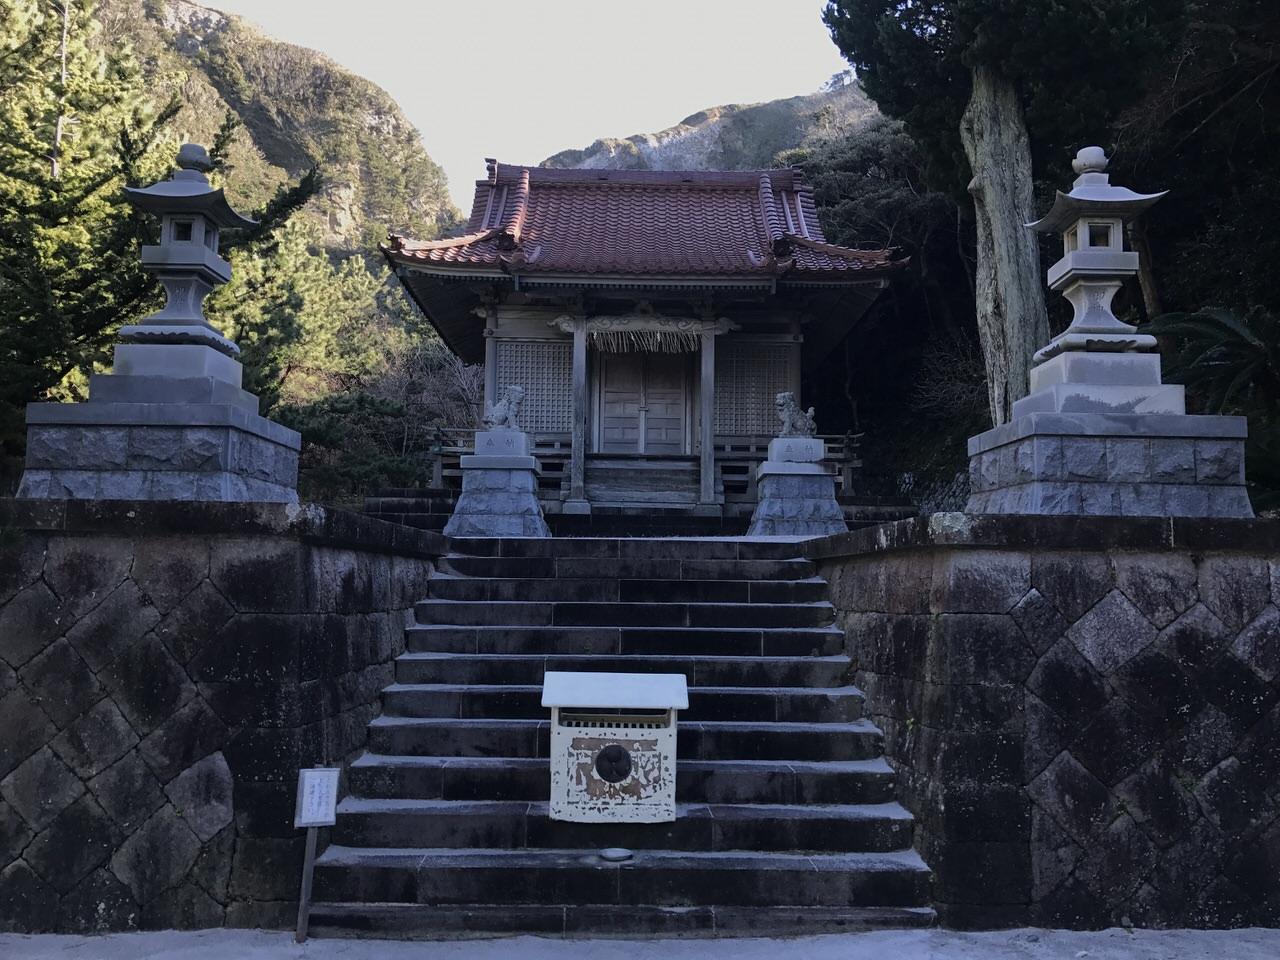 Kozushima tamashima 4861